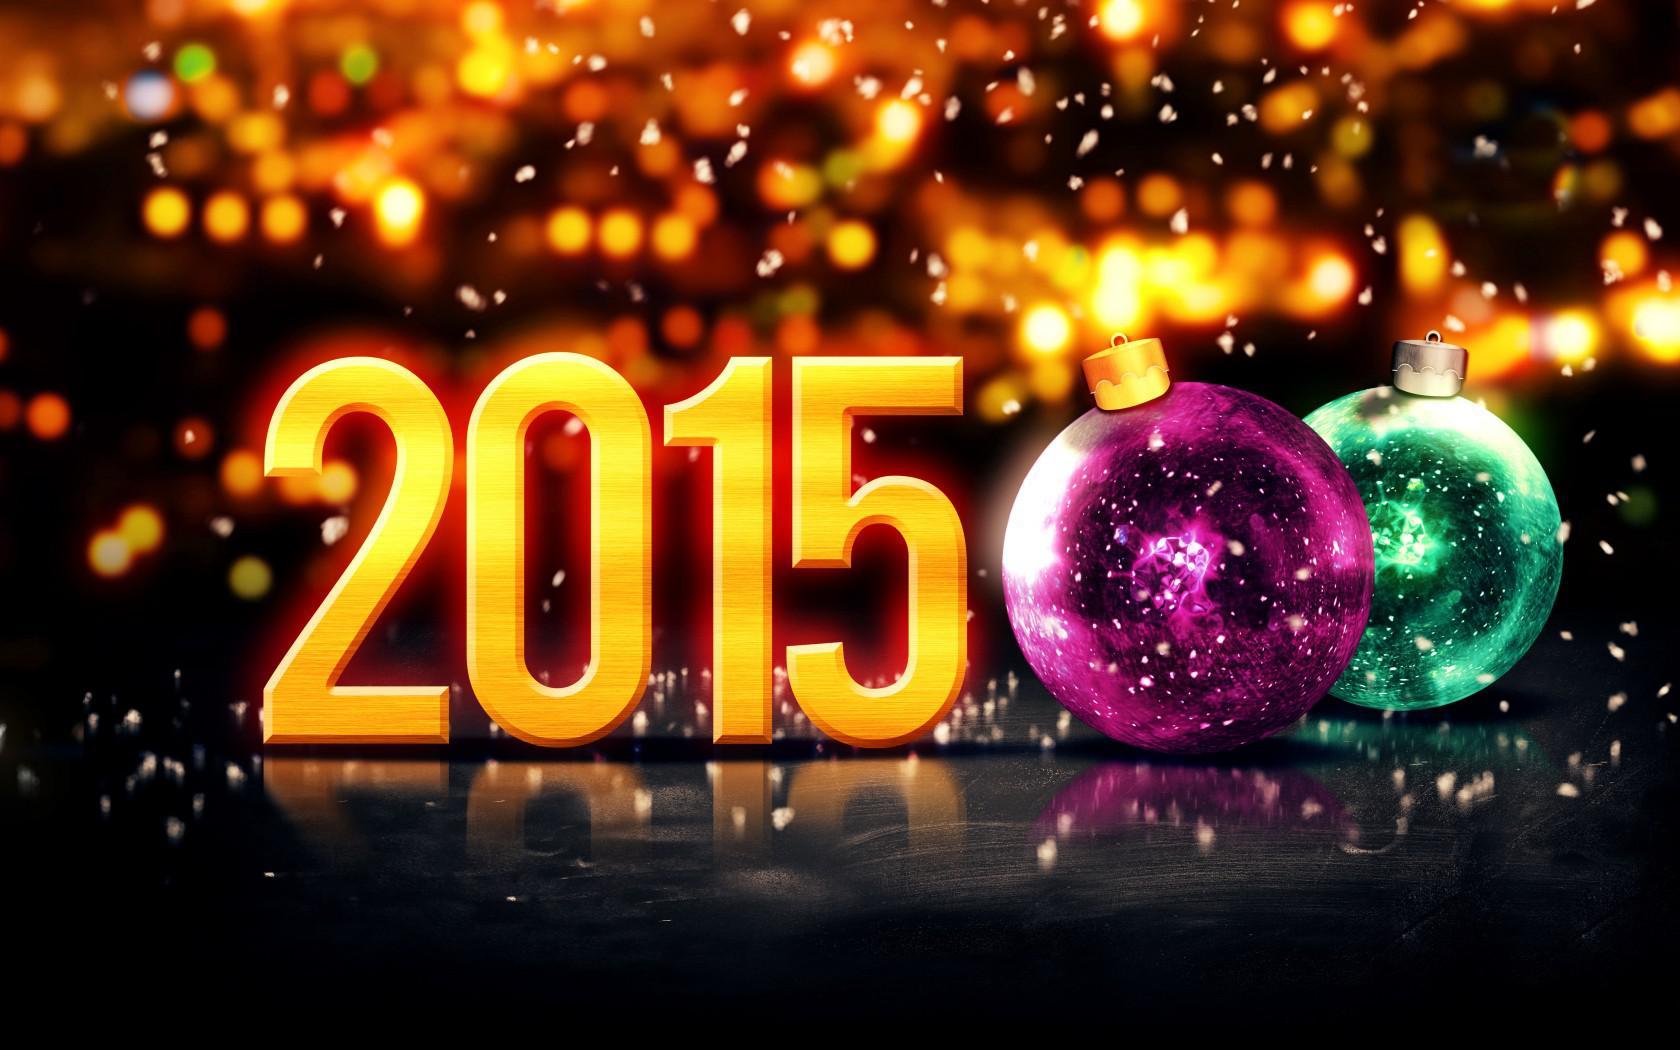 Merry Christmas 2015 Night Bokeh